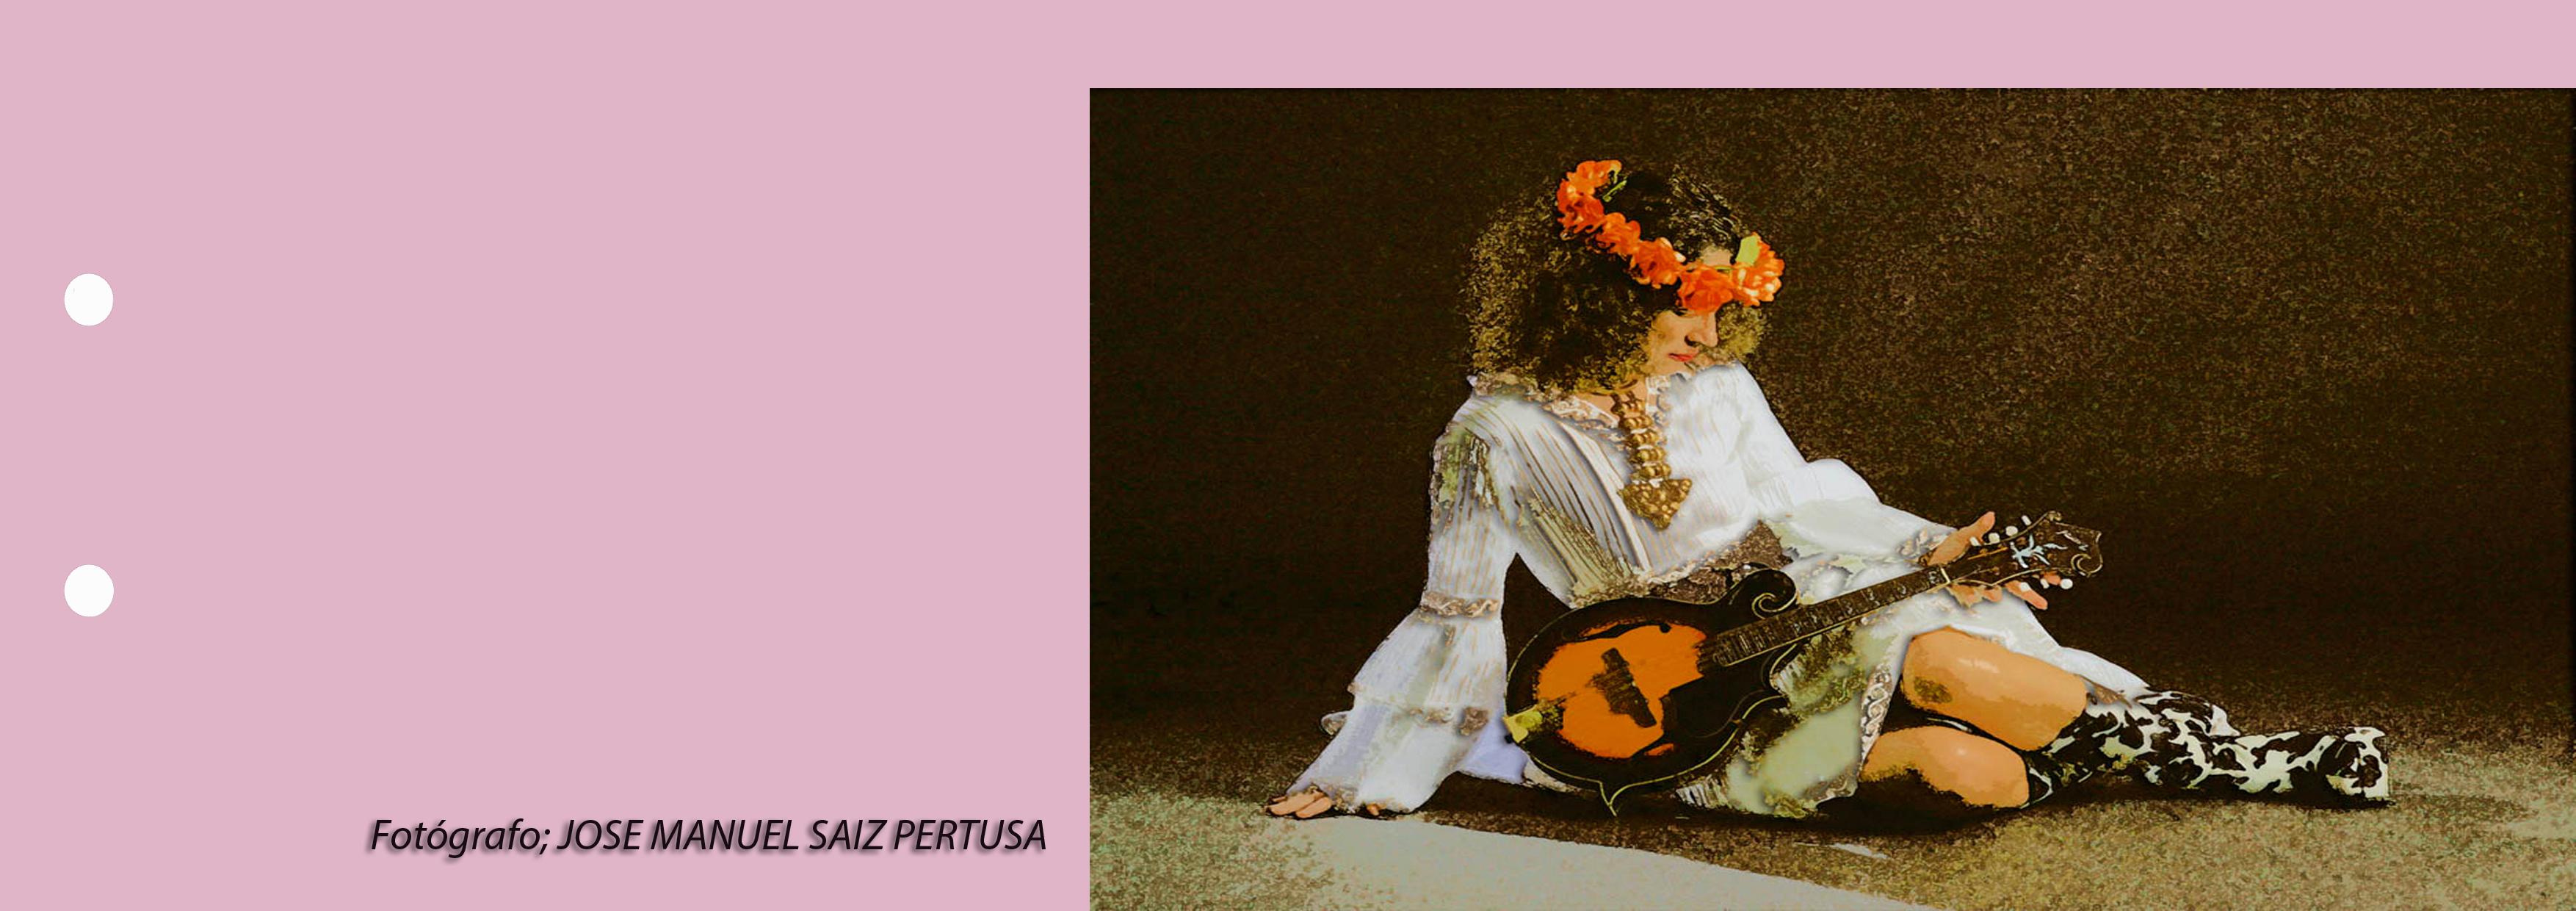 50-catalogo-JOSEMANUELSAIZPERTUSA.jpg